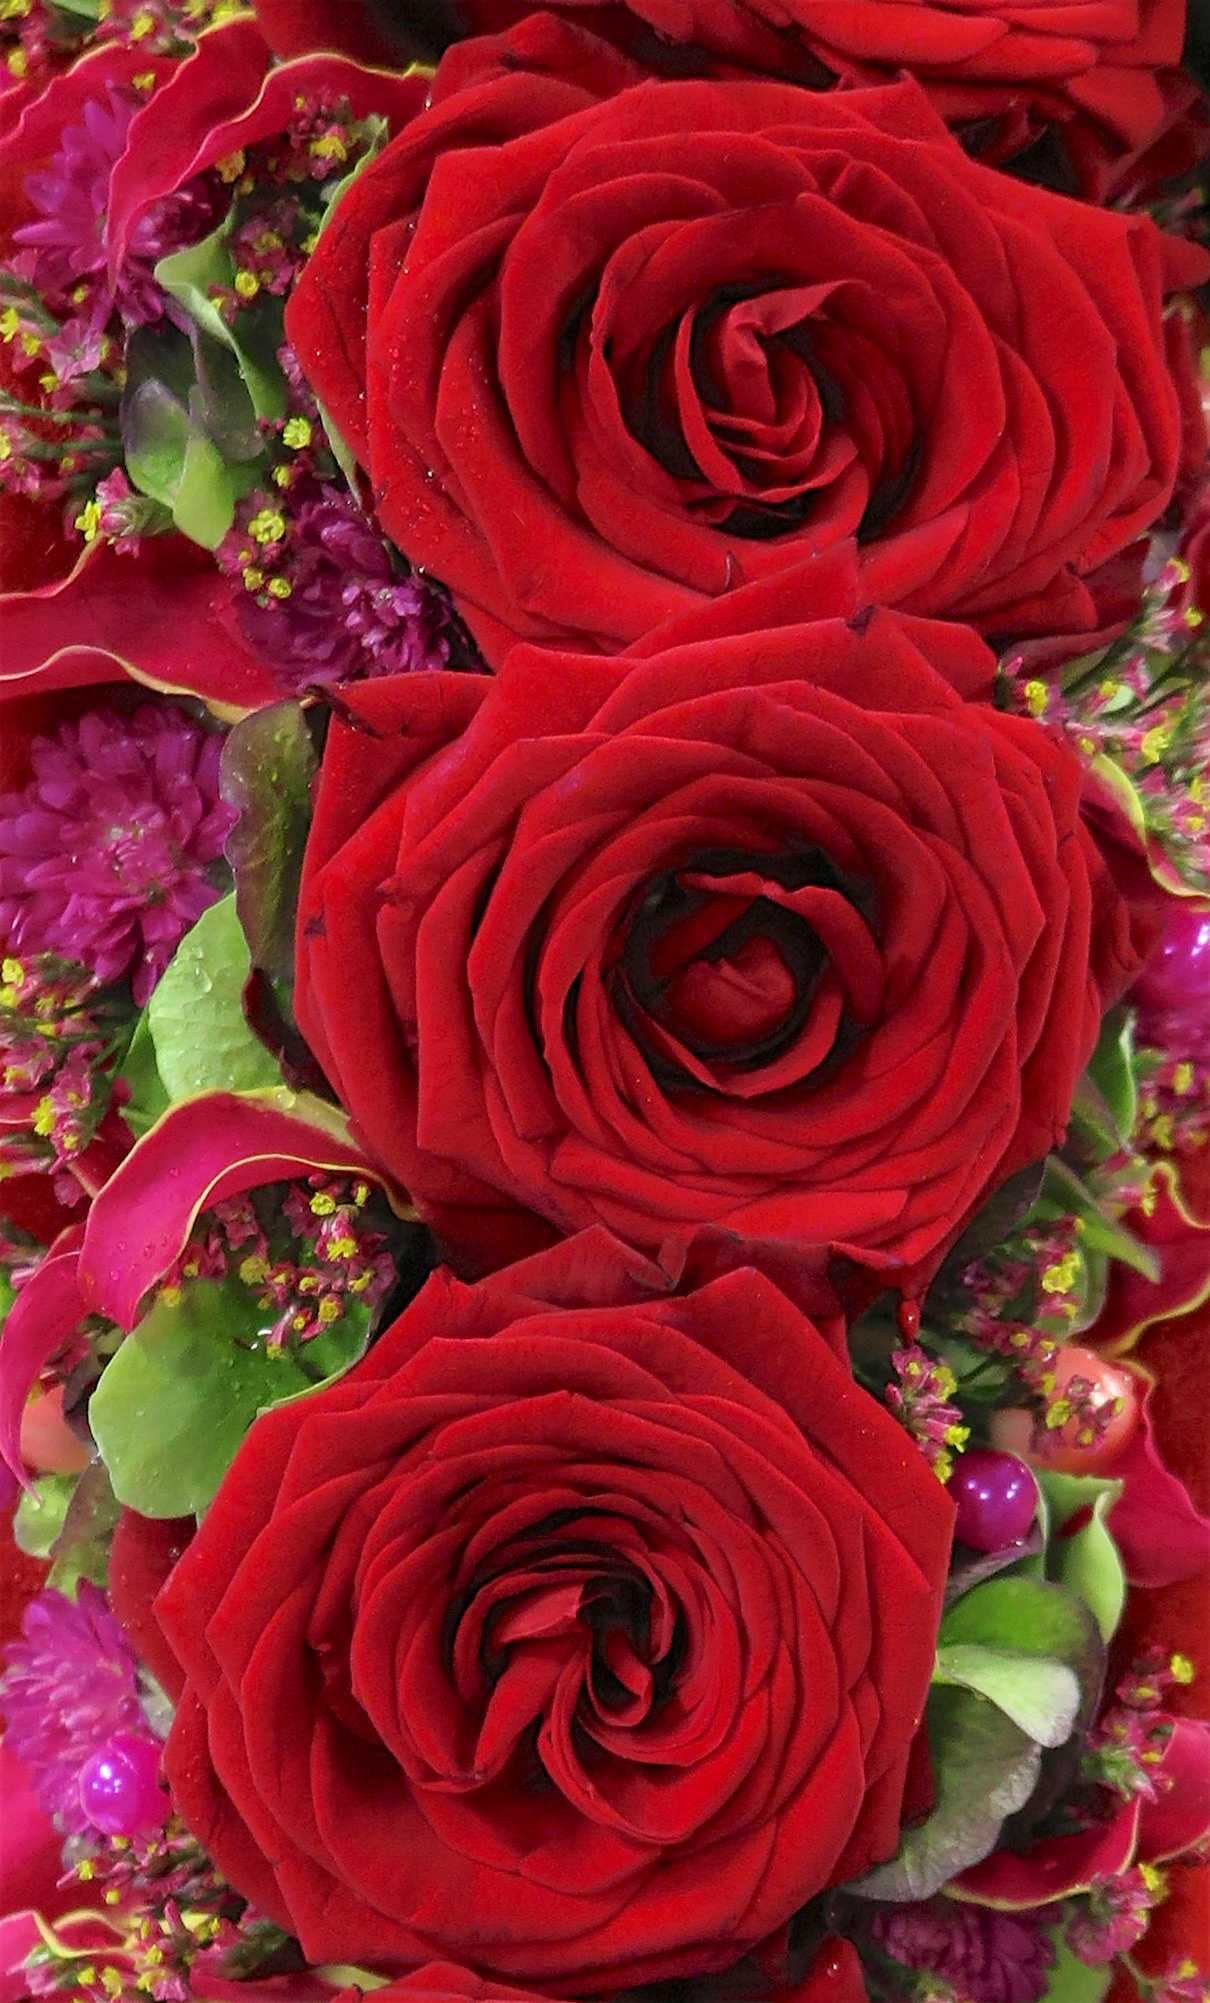 porta nova red naomi alex segura valentines day